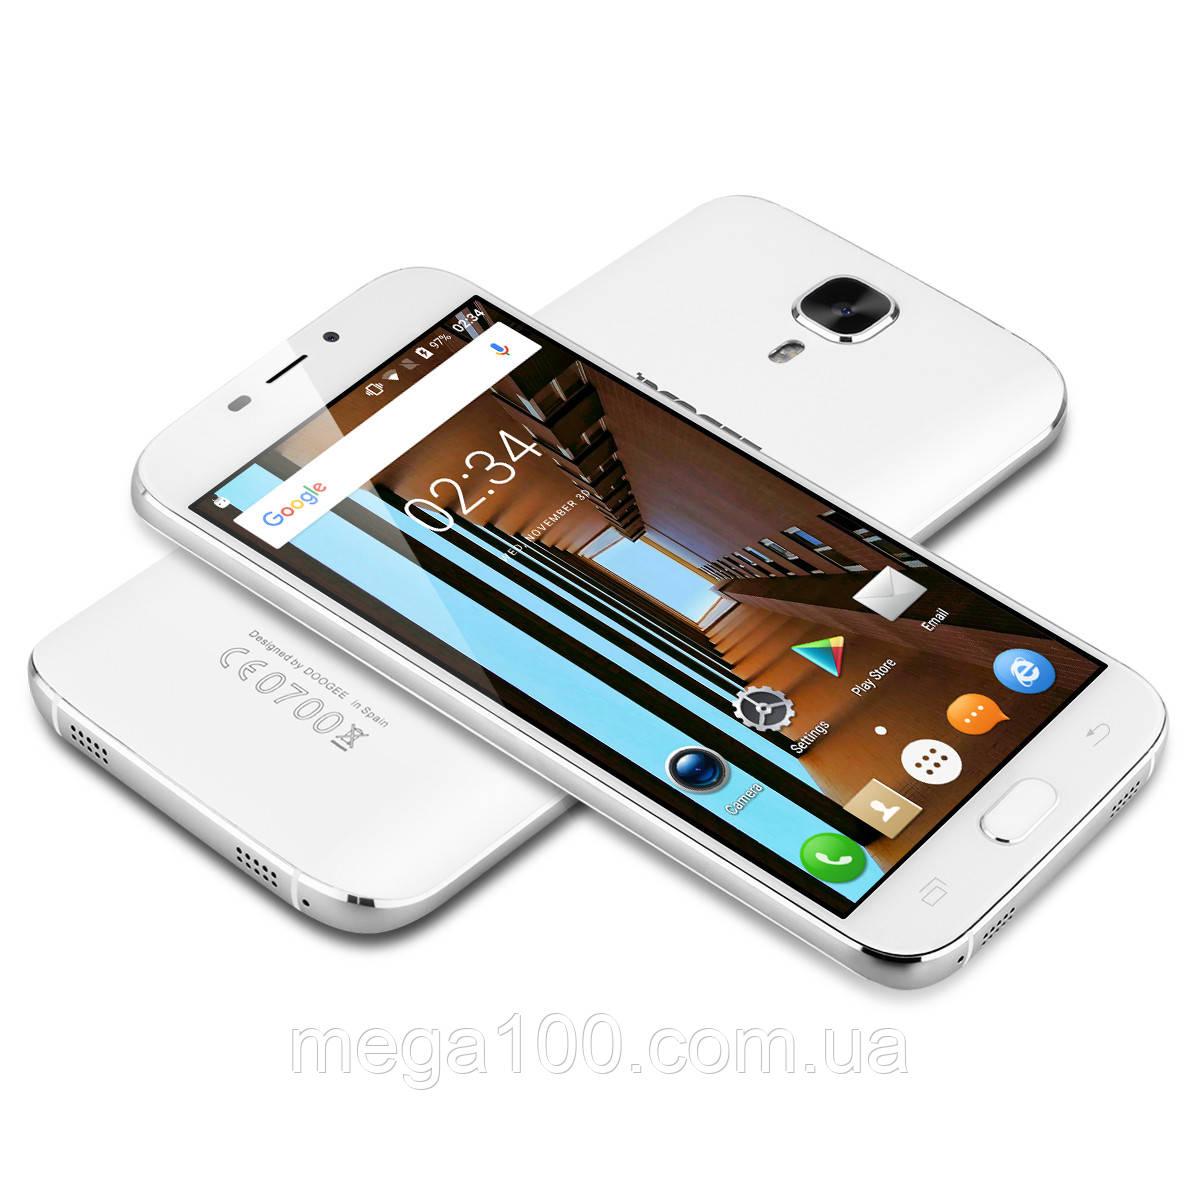 "Смартфон Doogee X9 PRO white (""5.5*2Gb RAM+16Gb*БАТАРЕЯ 6250mAh*13.0 MP"